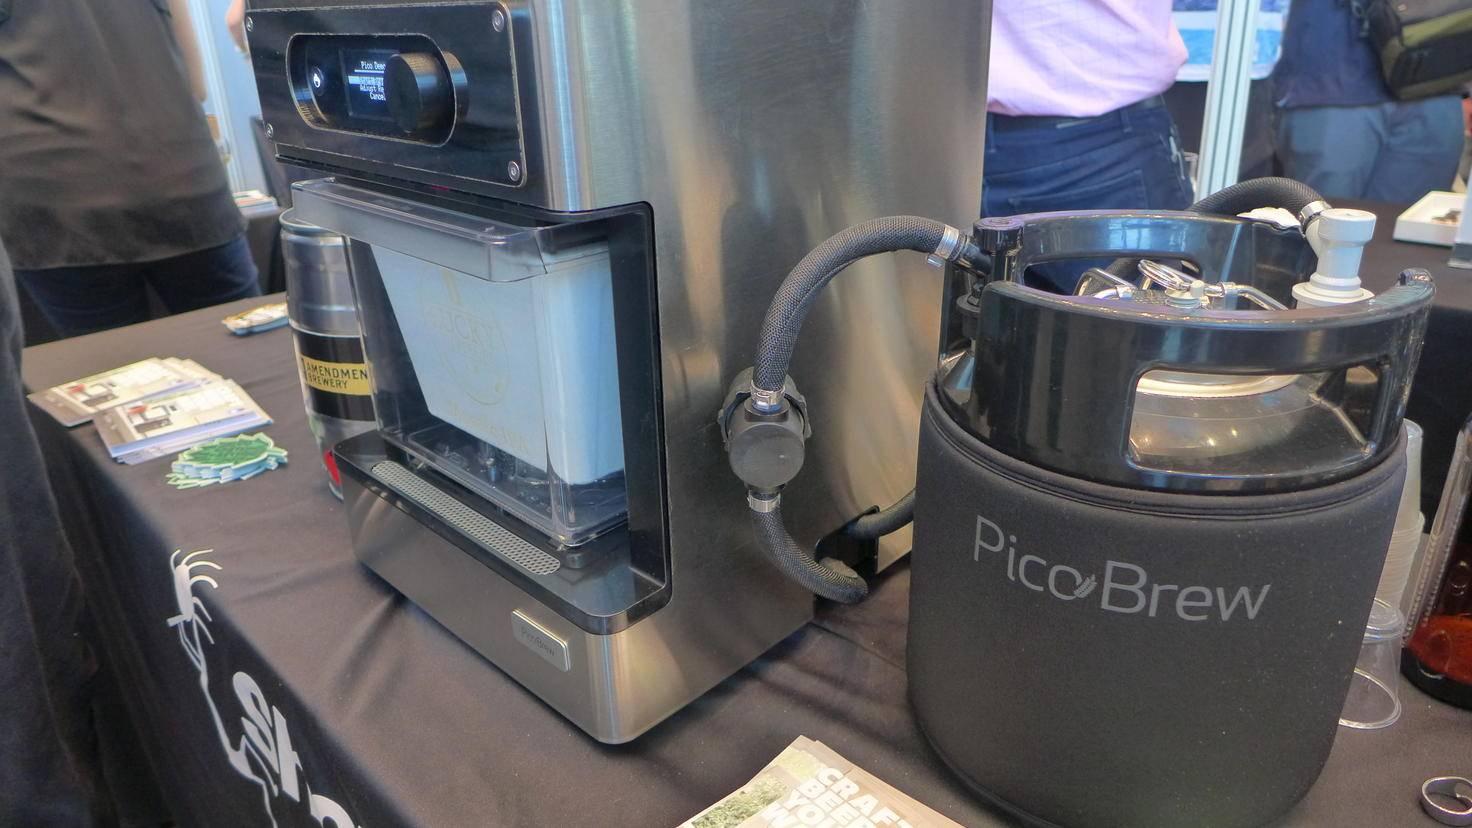 Picobrew IFA 2016